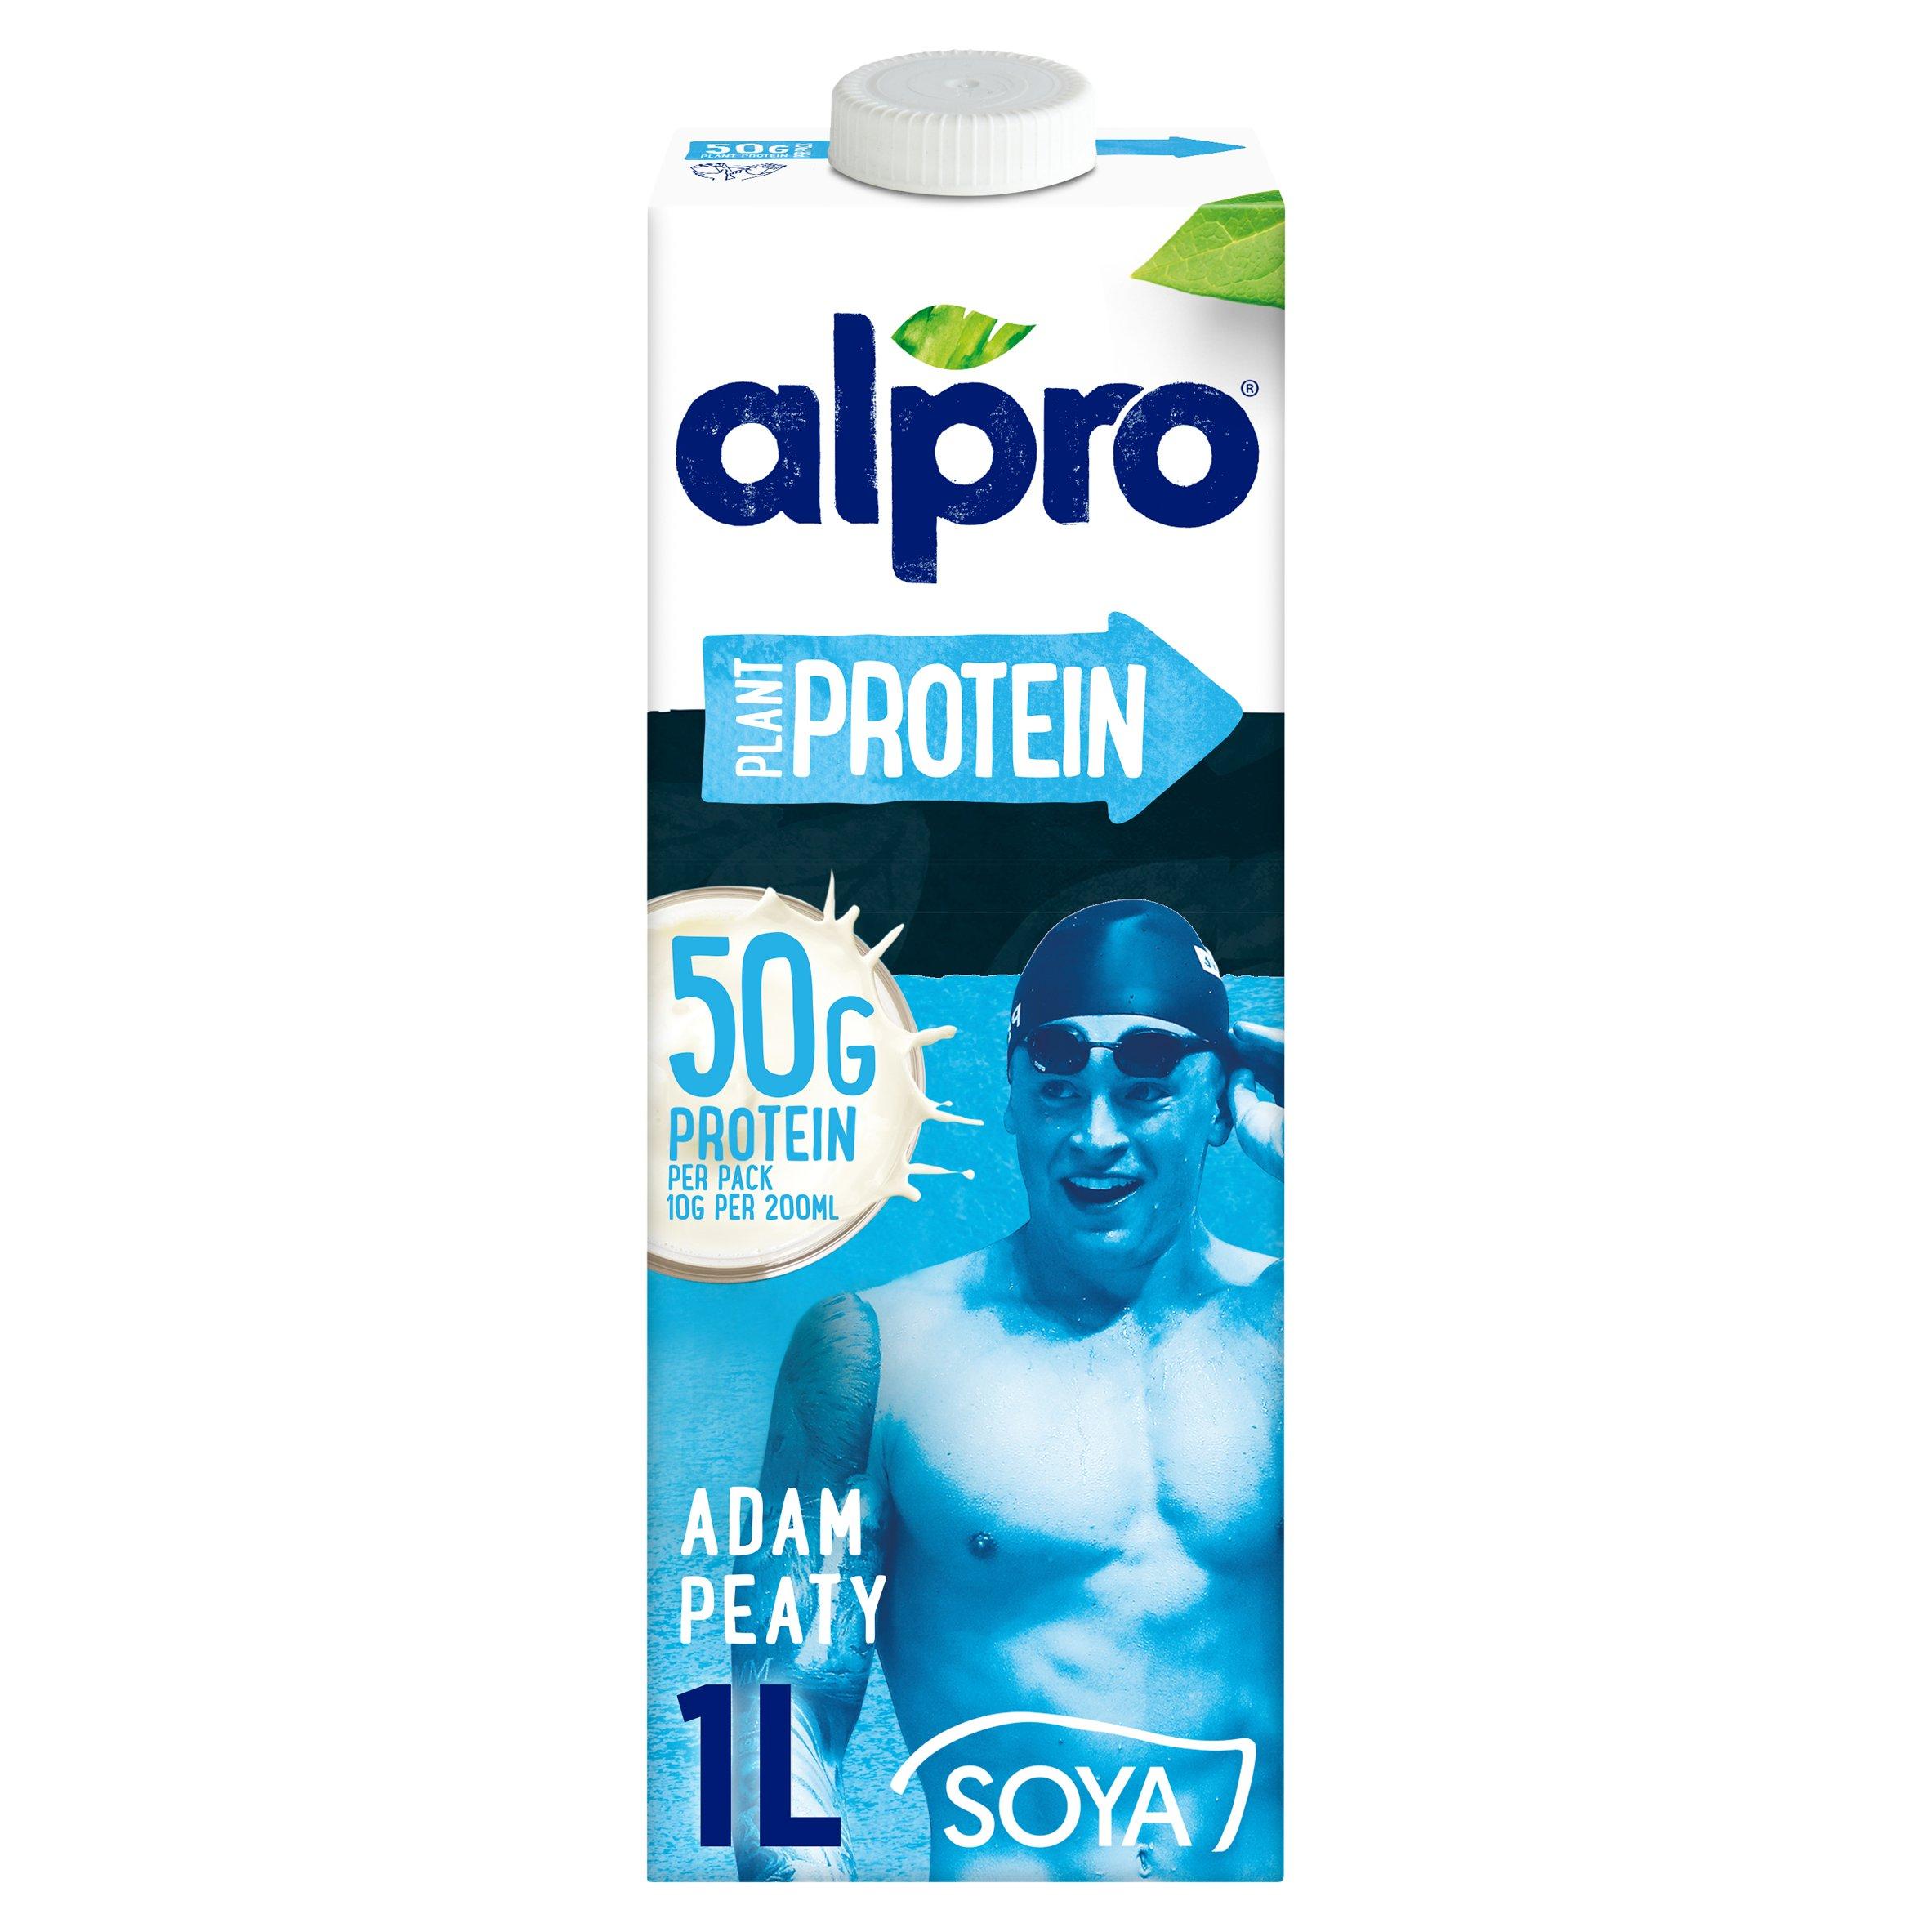 Alpro Plant Protein Original Soya Drink 1L